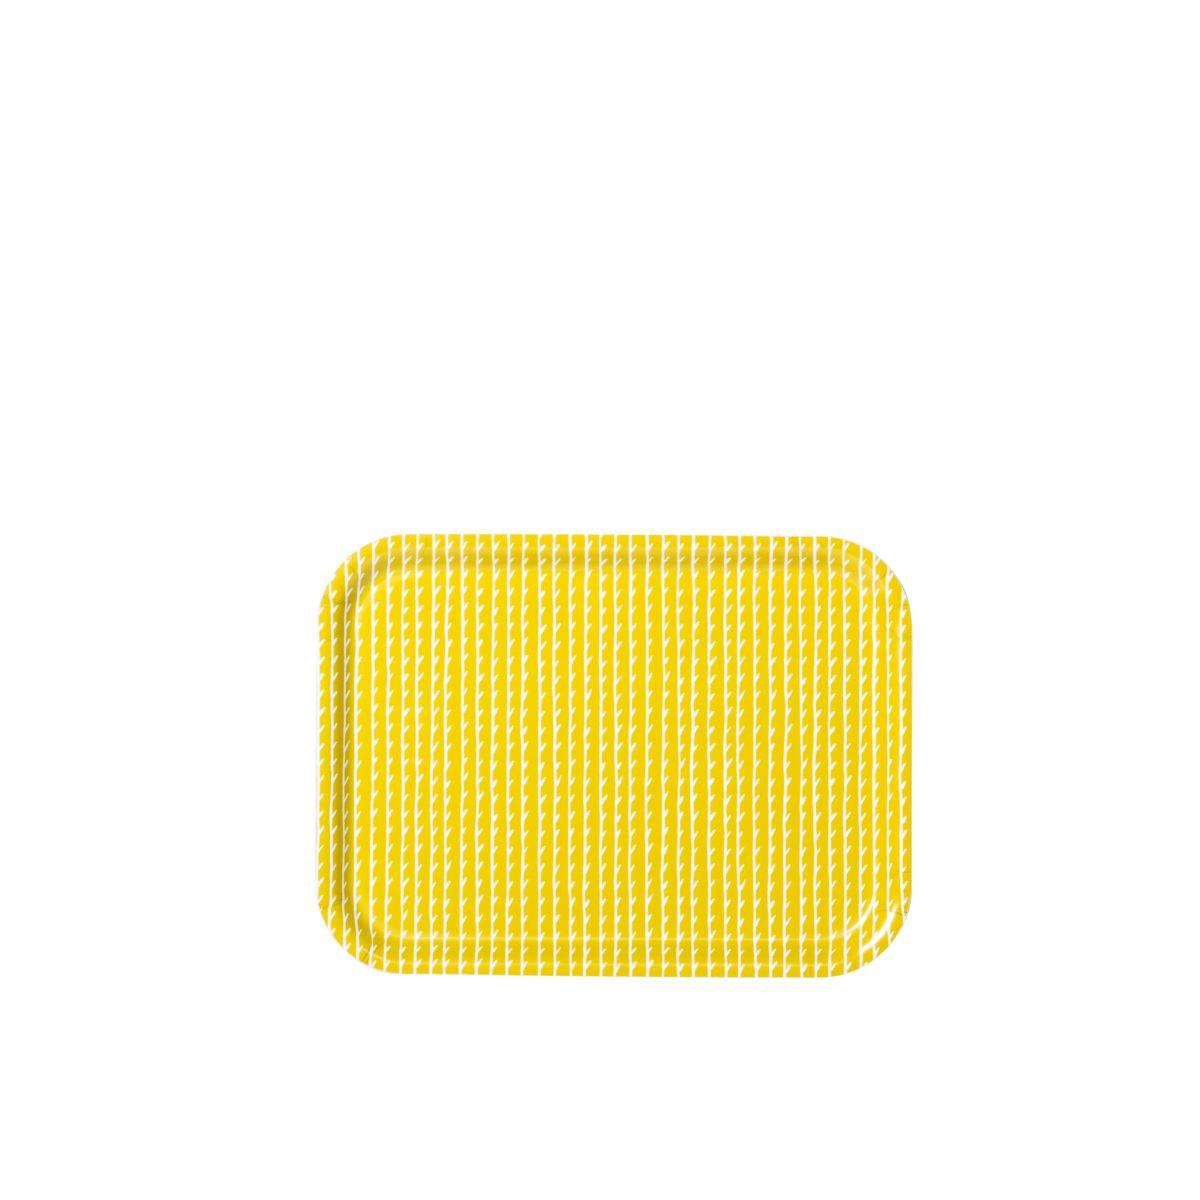 Rivi Tray yellow / white small